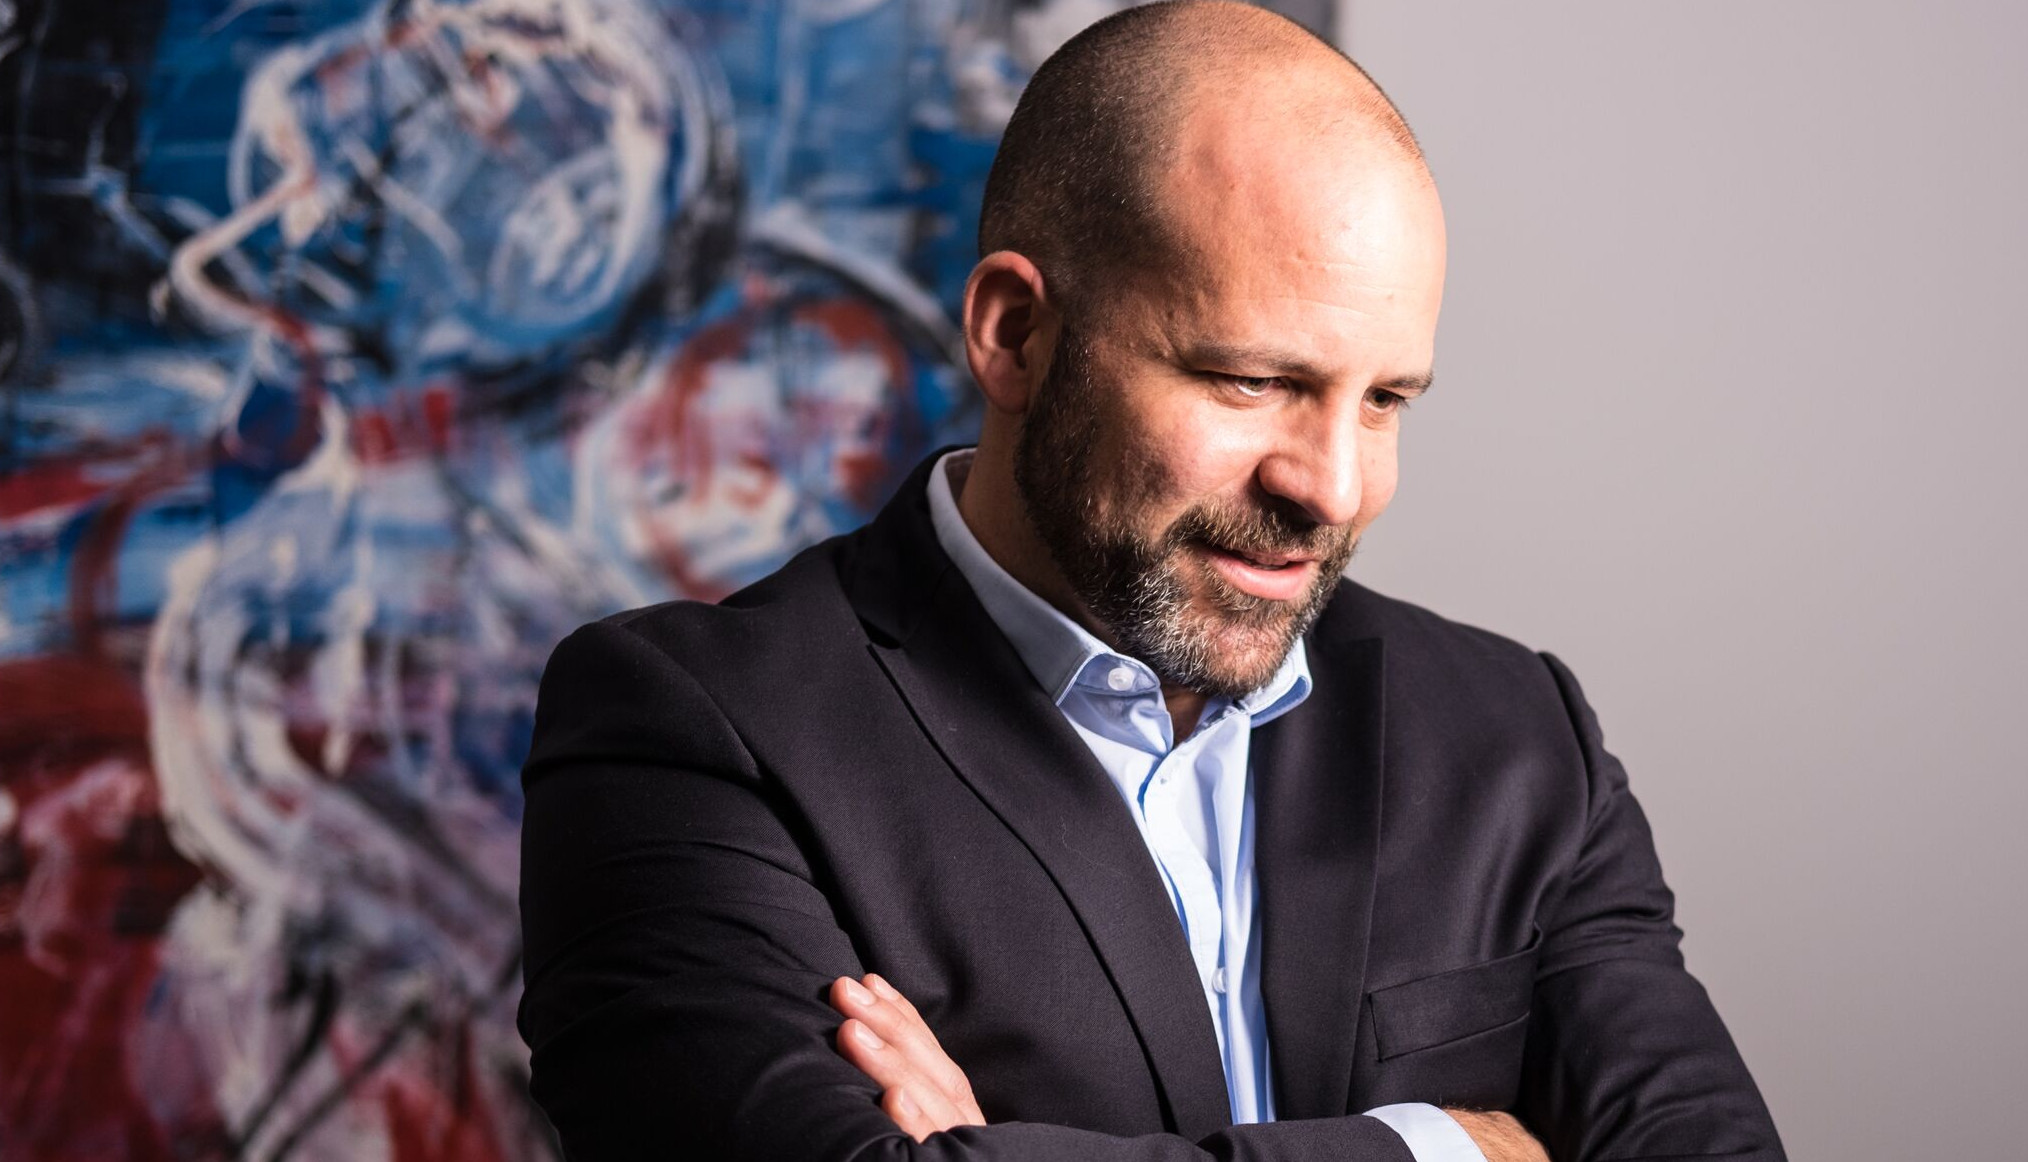 Dr. Simon Hahnzog